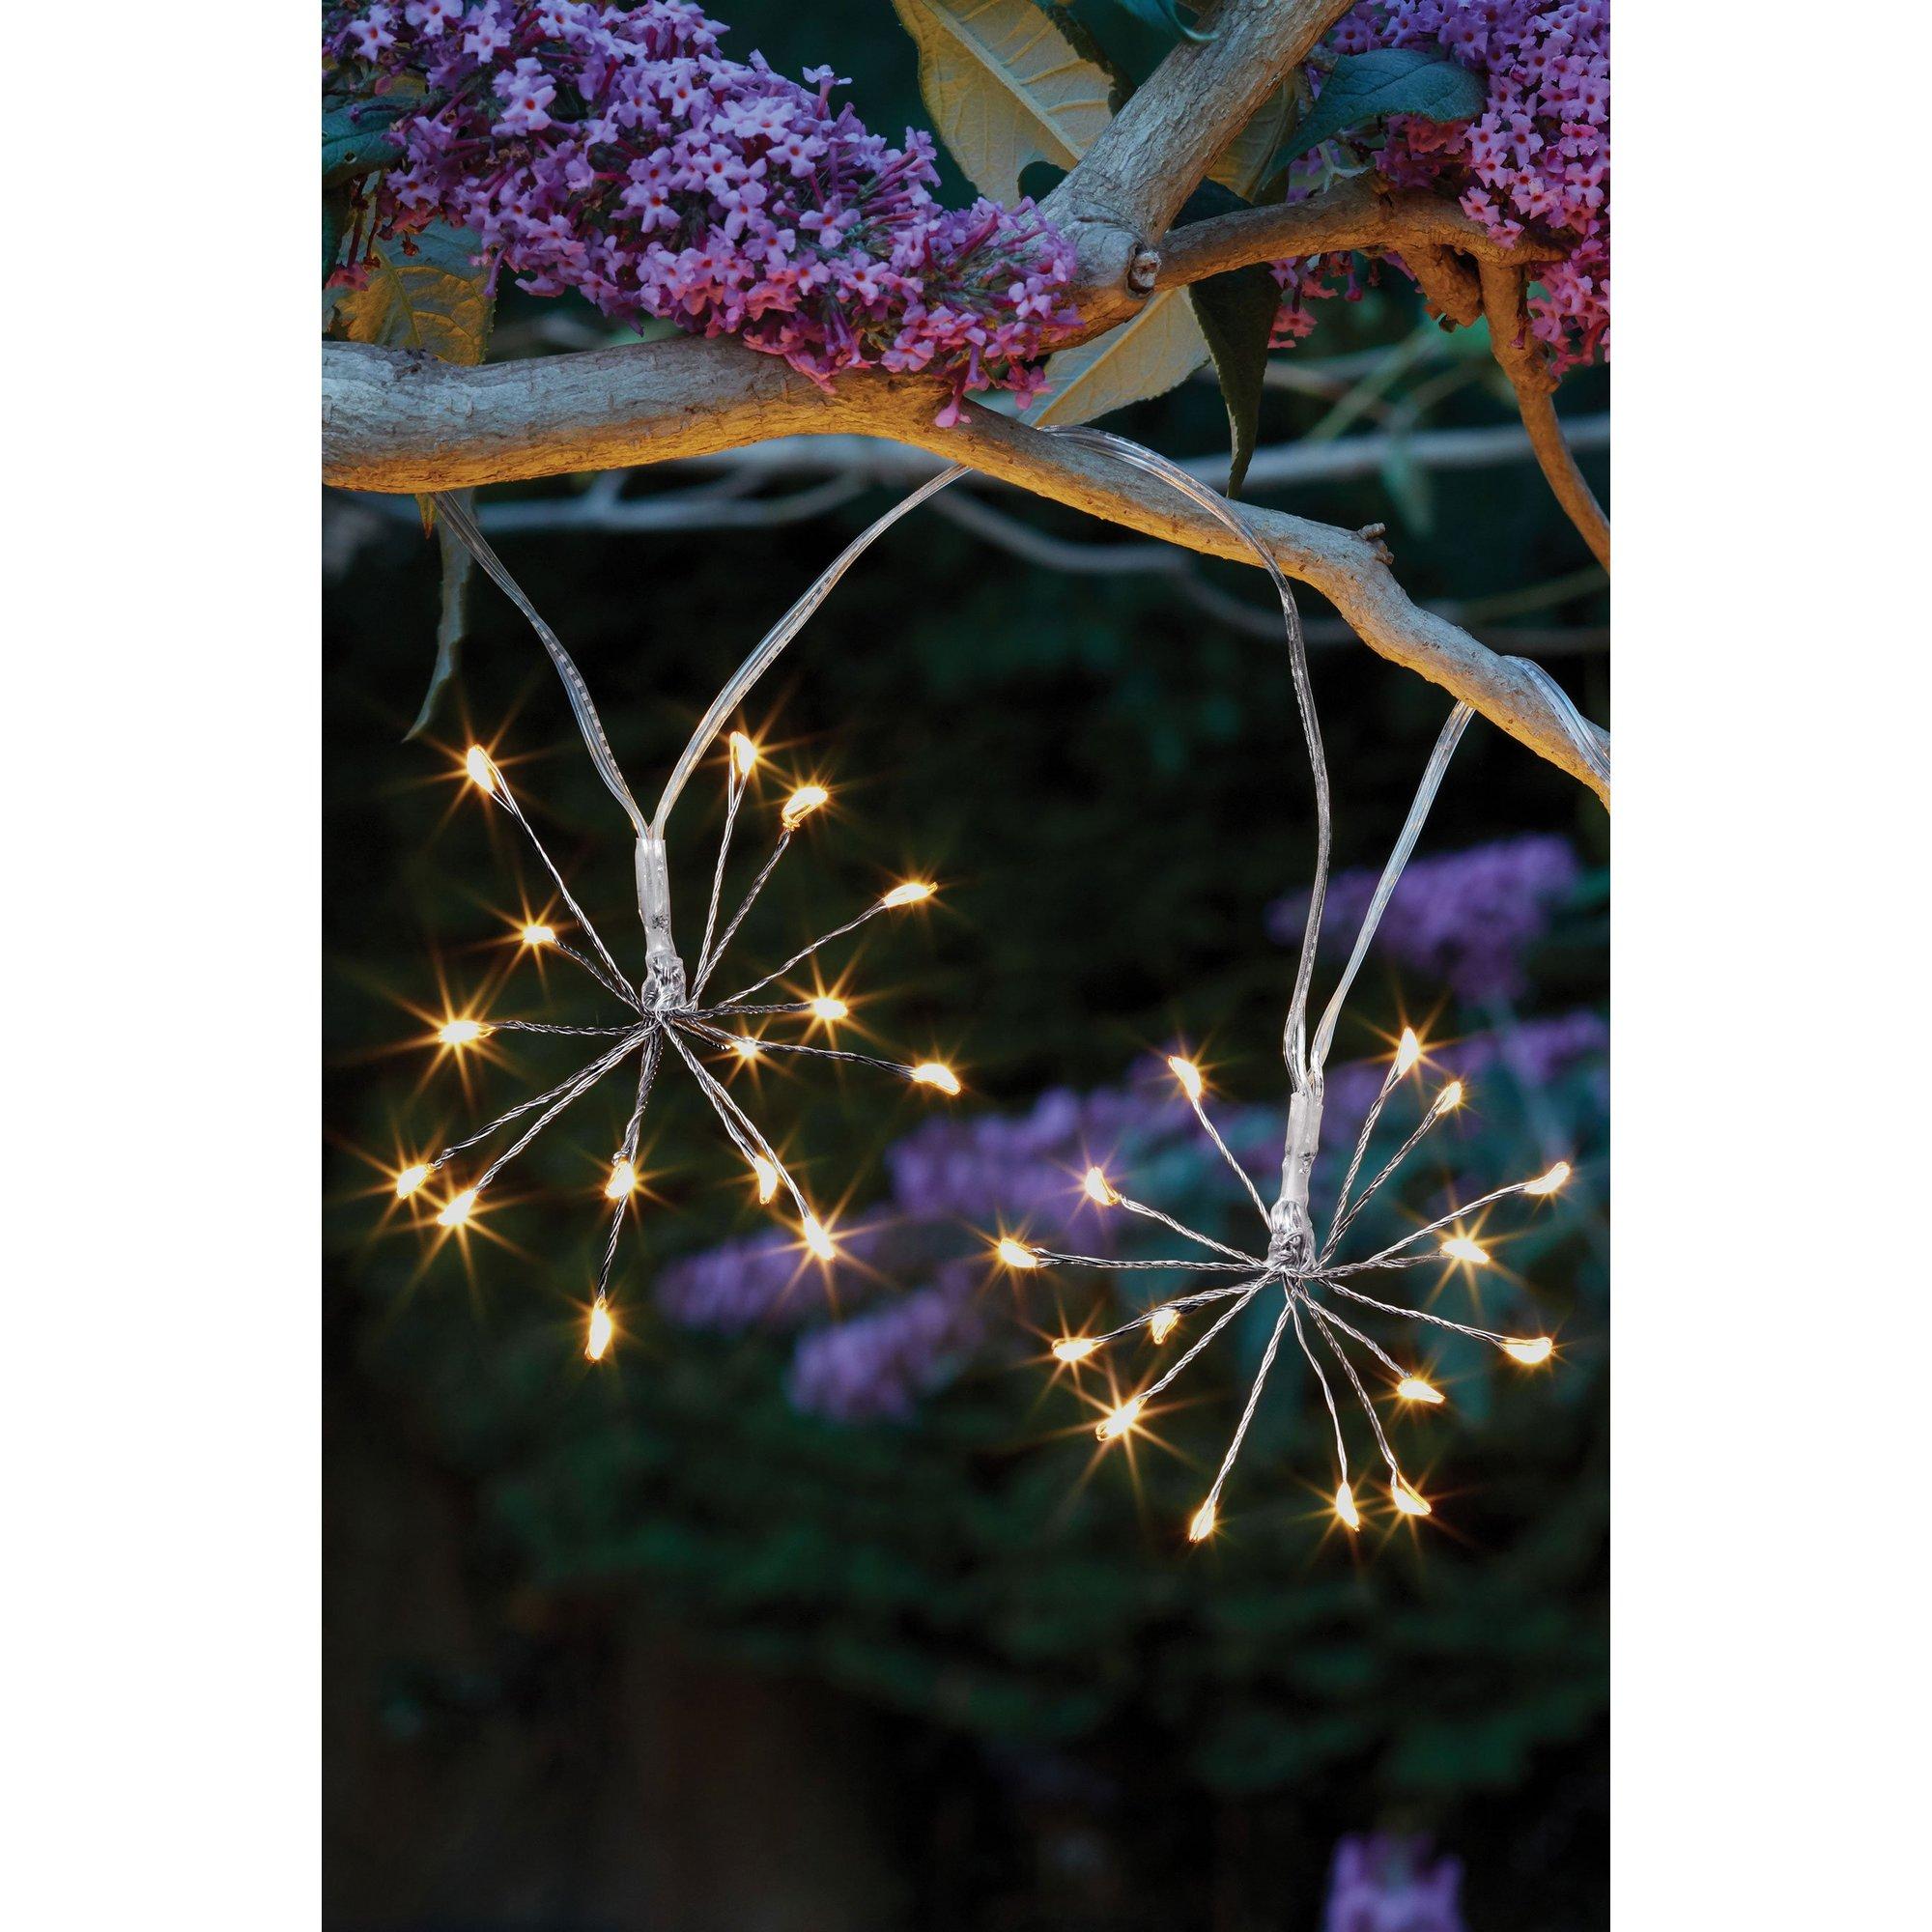 Image of 10 Starburst Lights